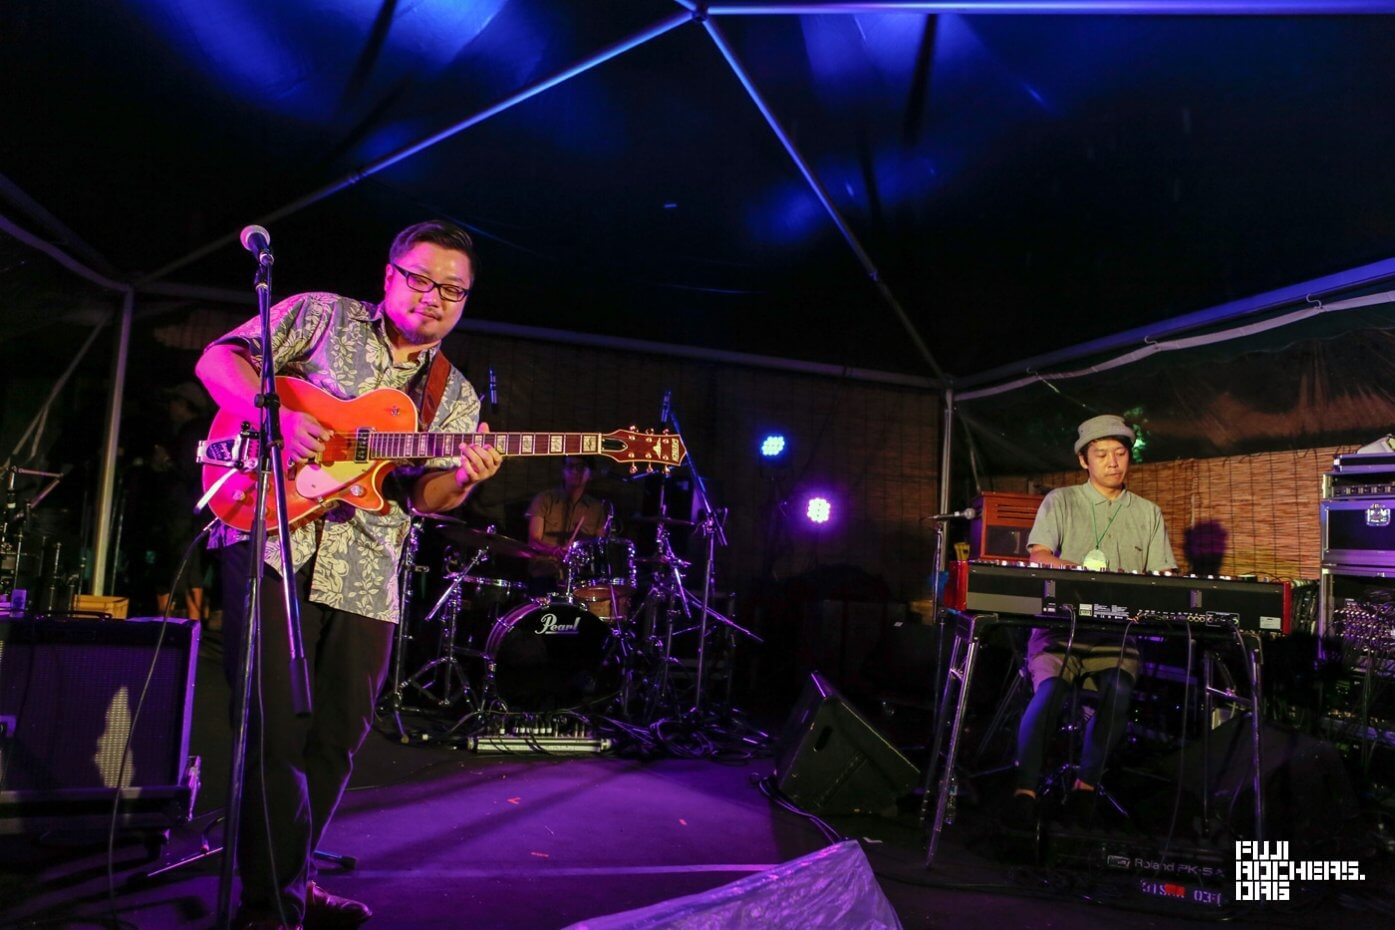 井上大地 & Izakaya Band